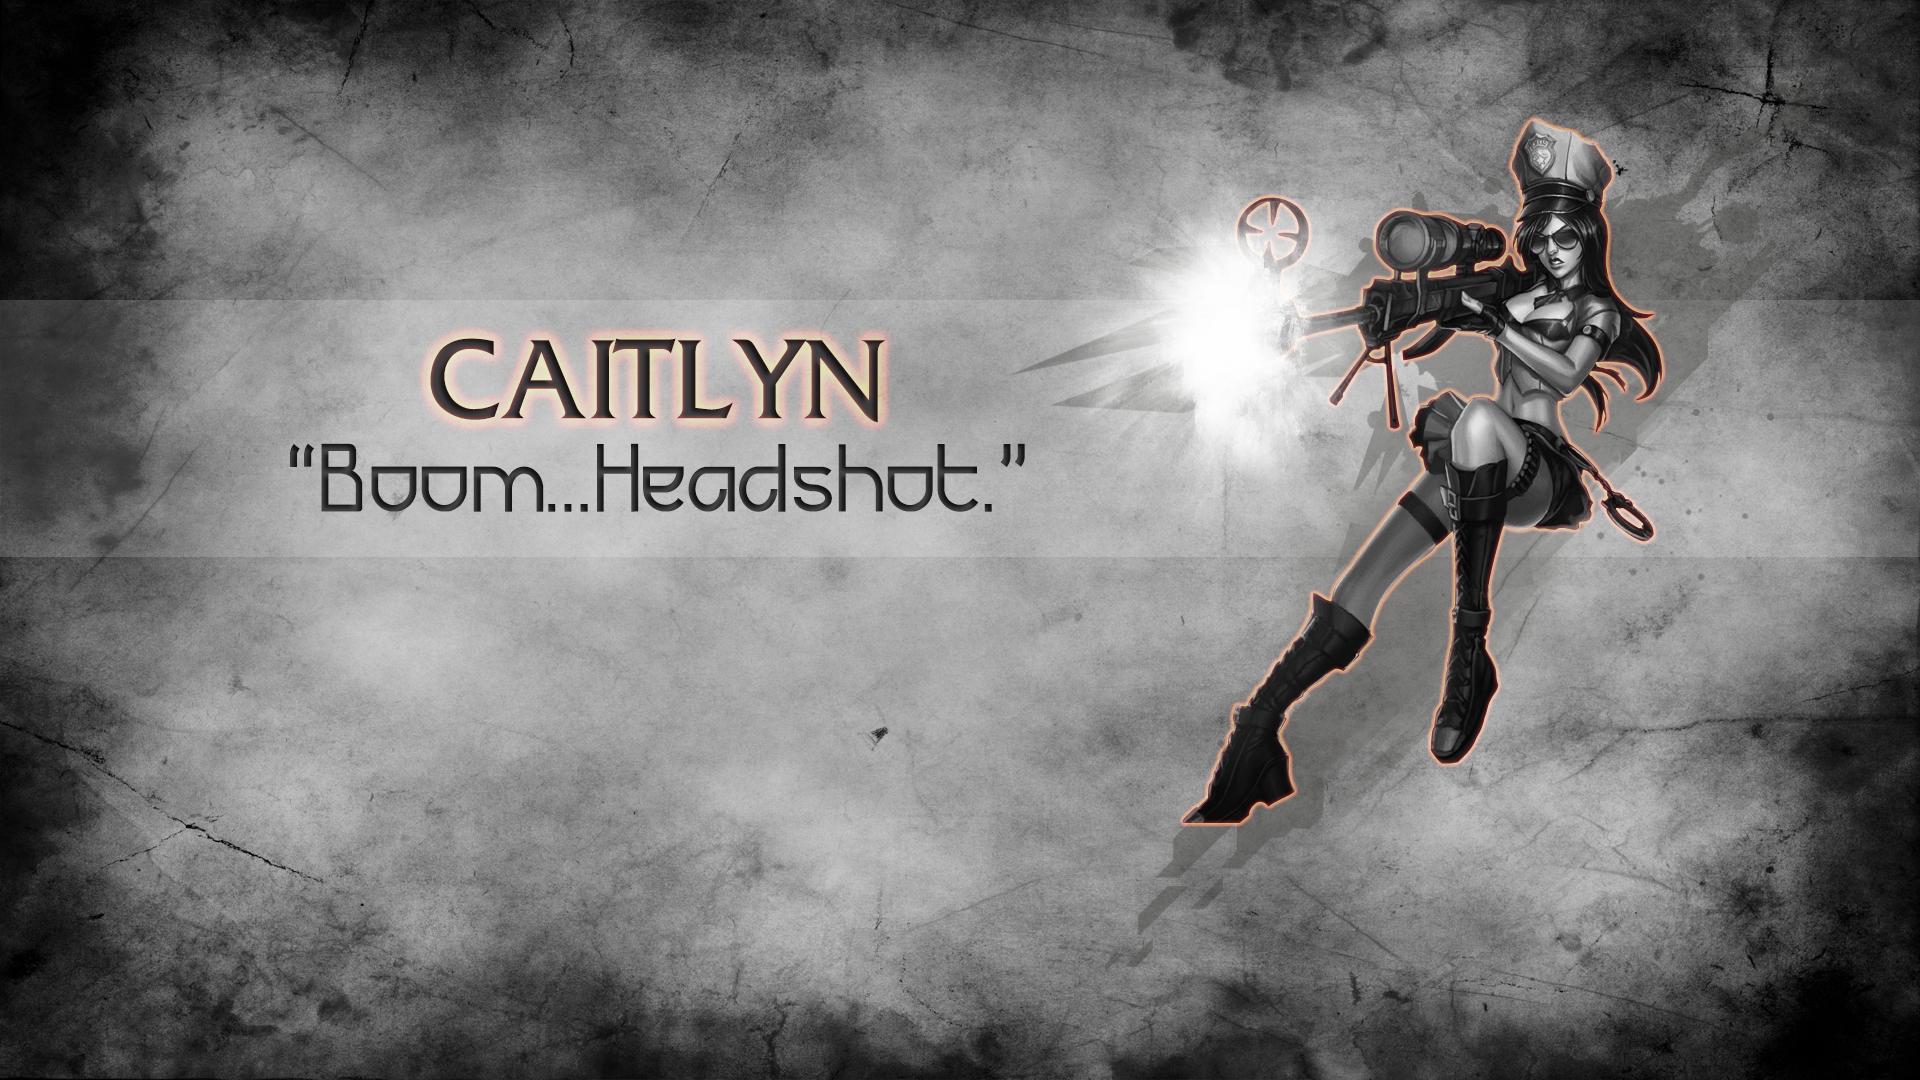 Wallpaper Caitlyn League Of Legends 1920x1080 T0op0o